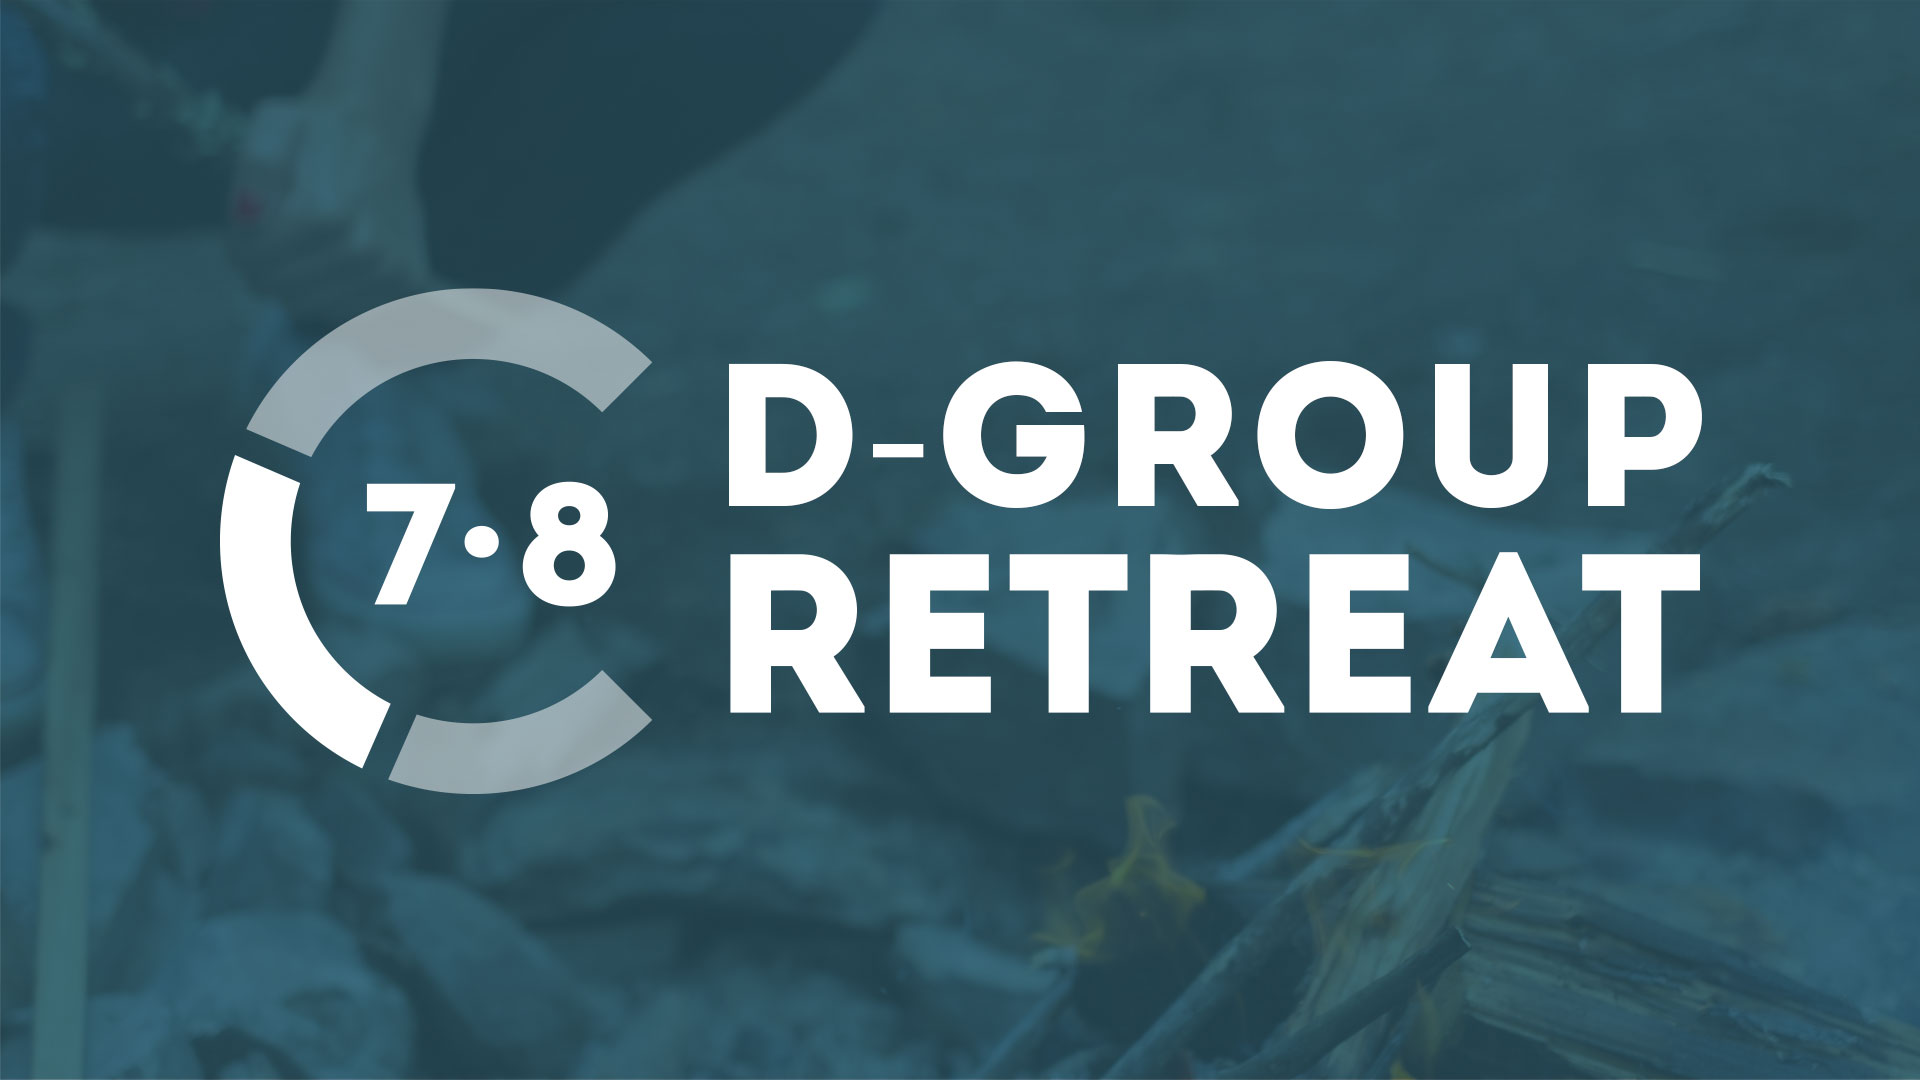 78-dgroup-retreat